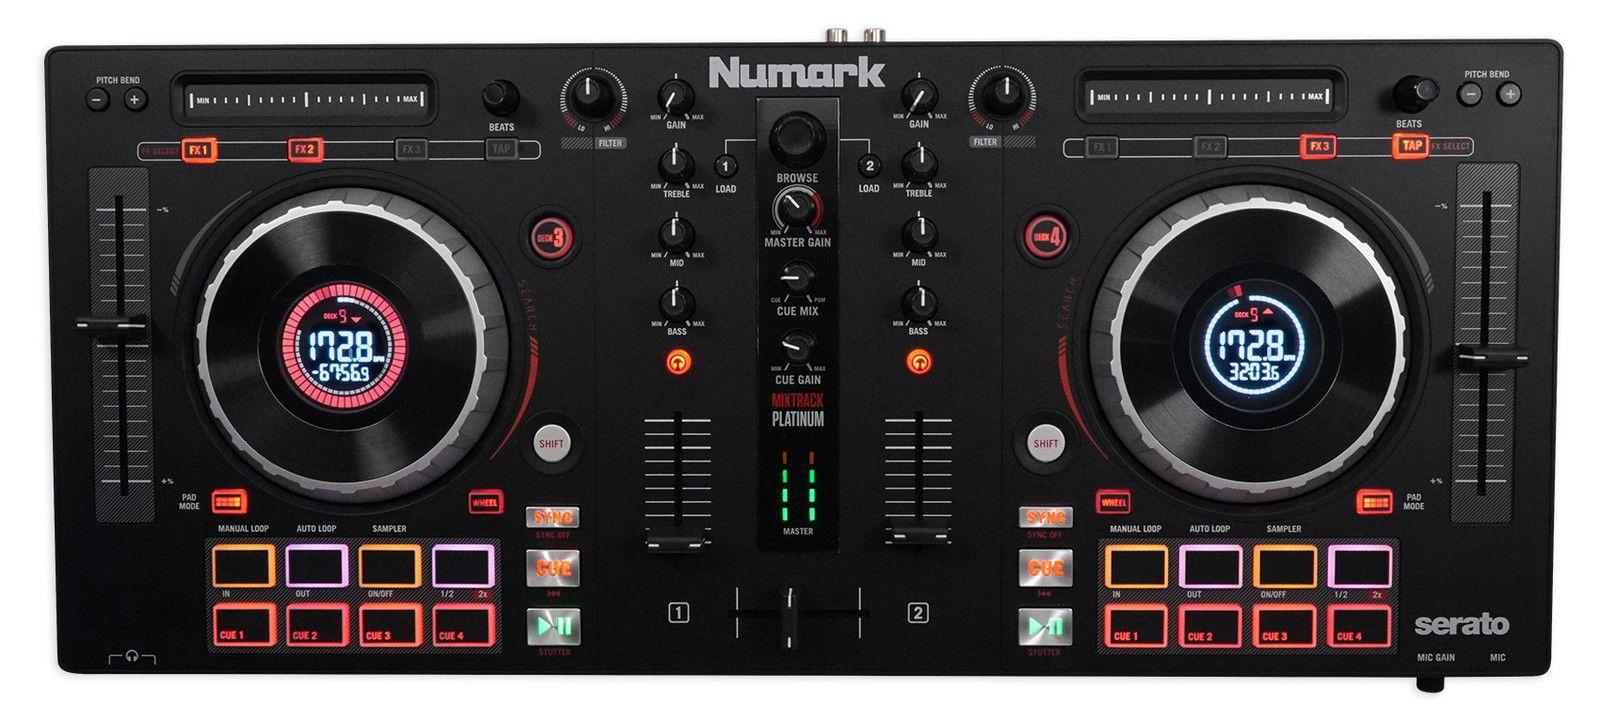 Numark Mixtrack Platinum 4-Ch  Serato DJ Controller w/ Jog